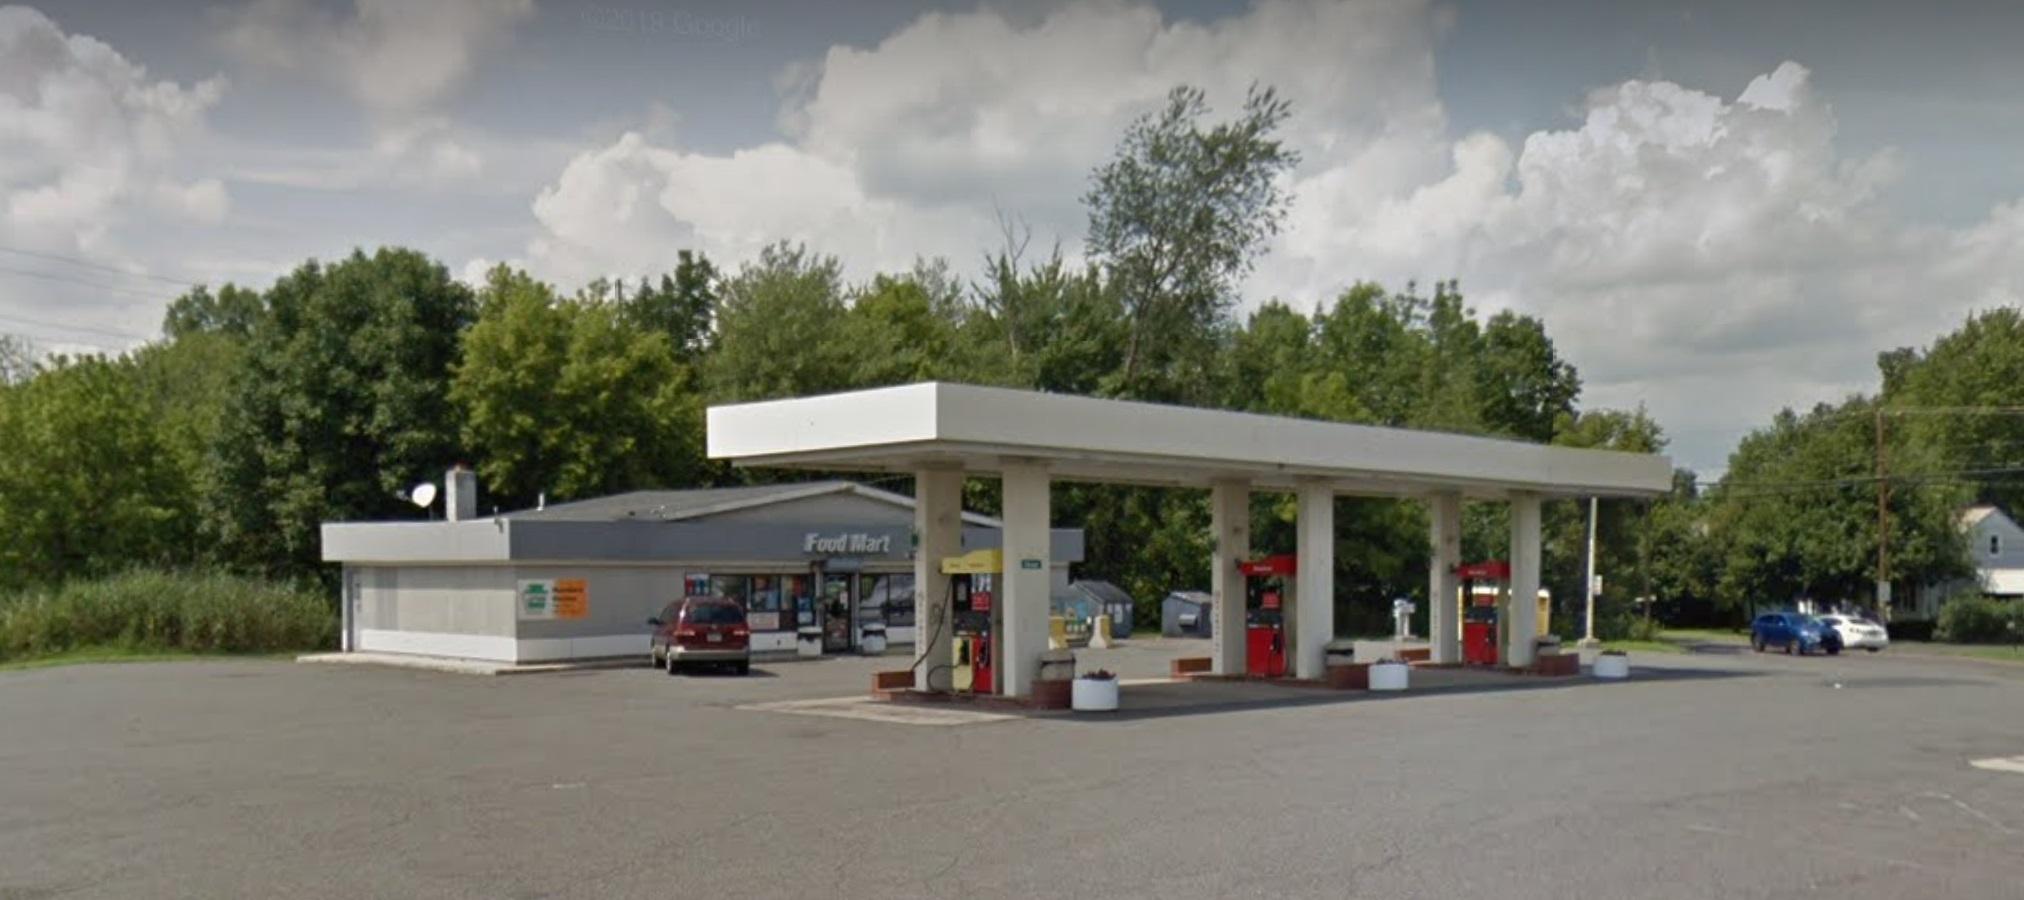 bitcoin atm at foodmart quakertown gas station